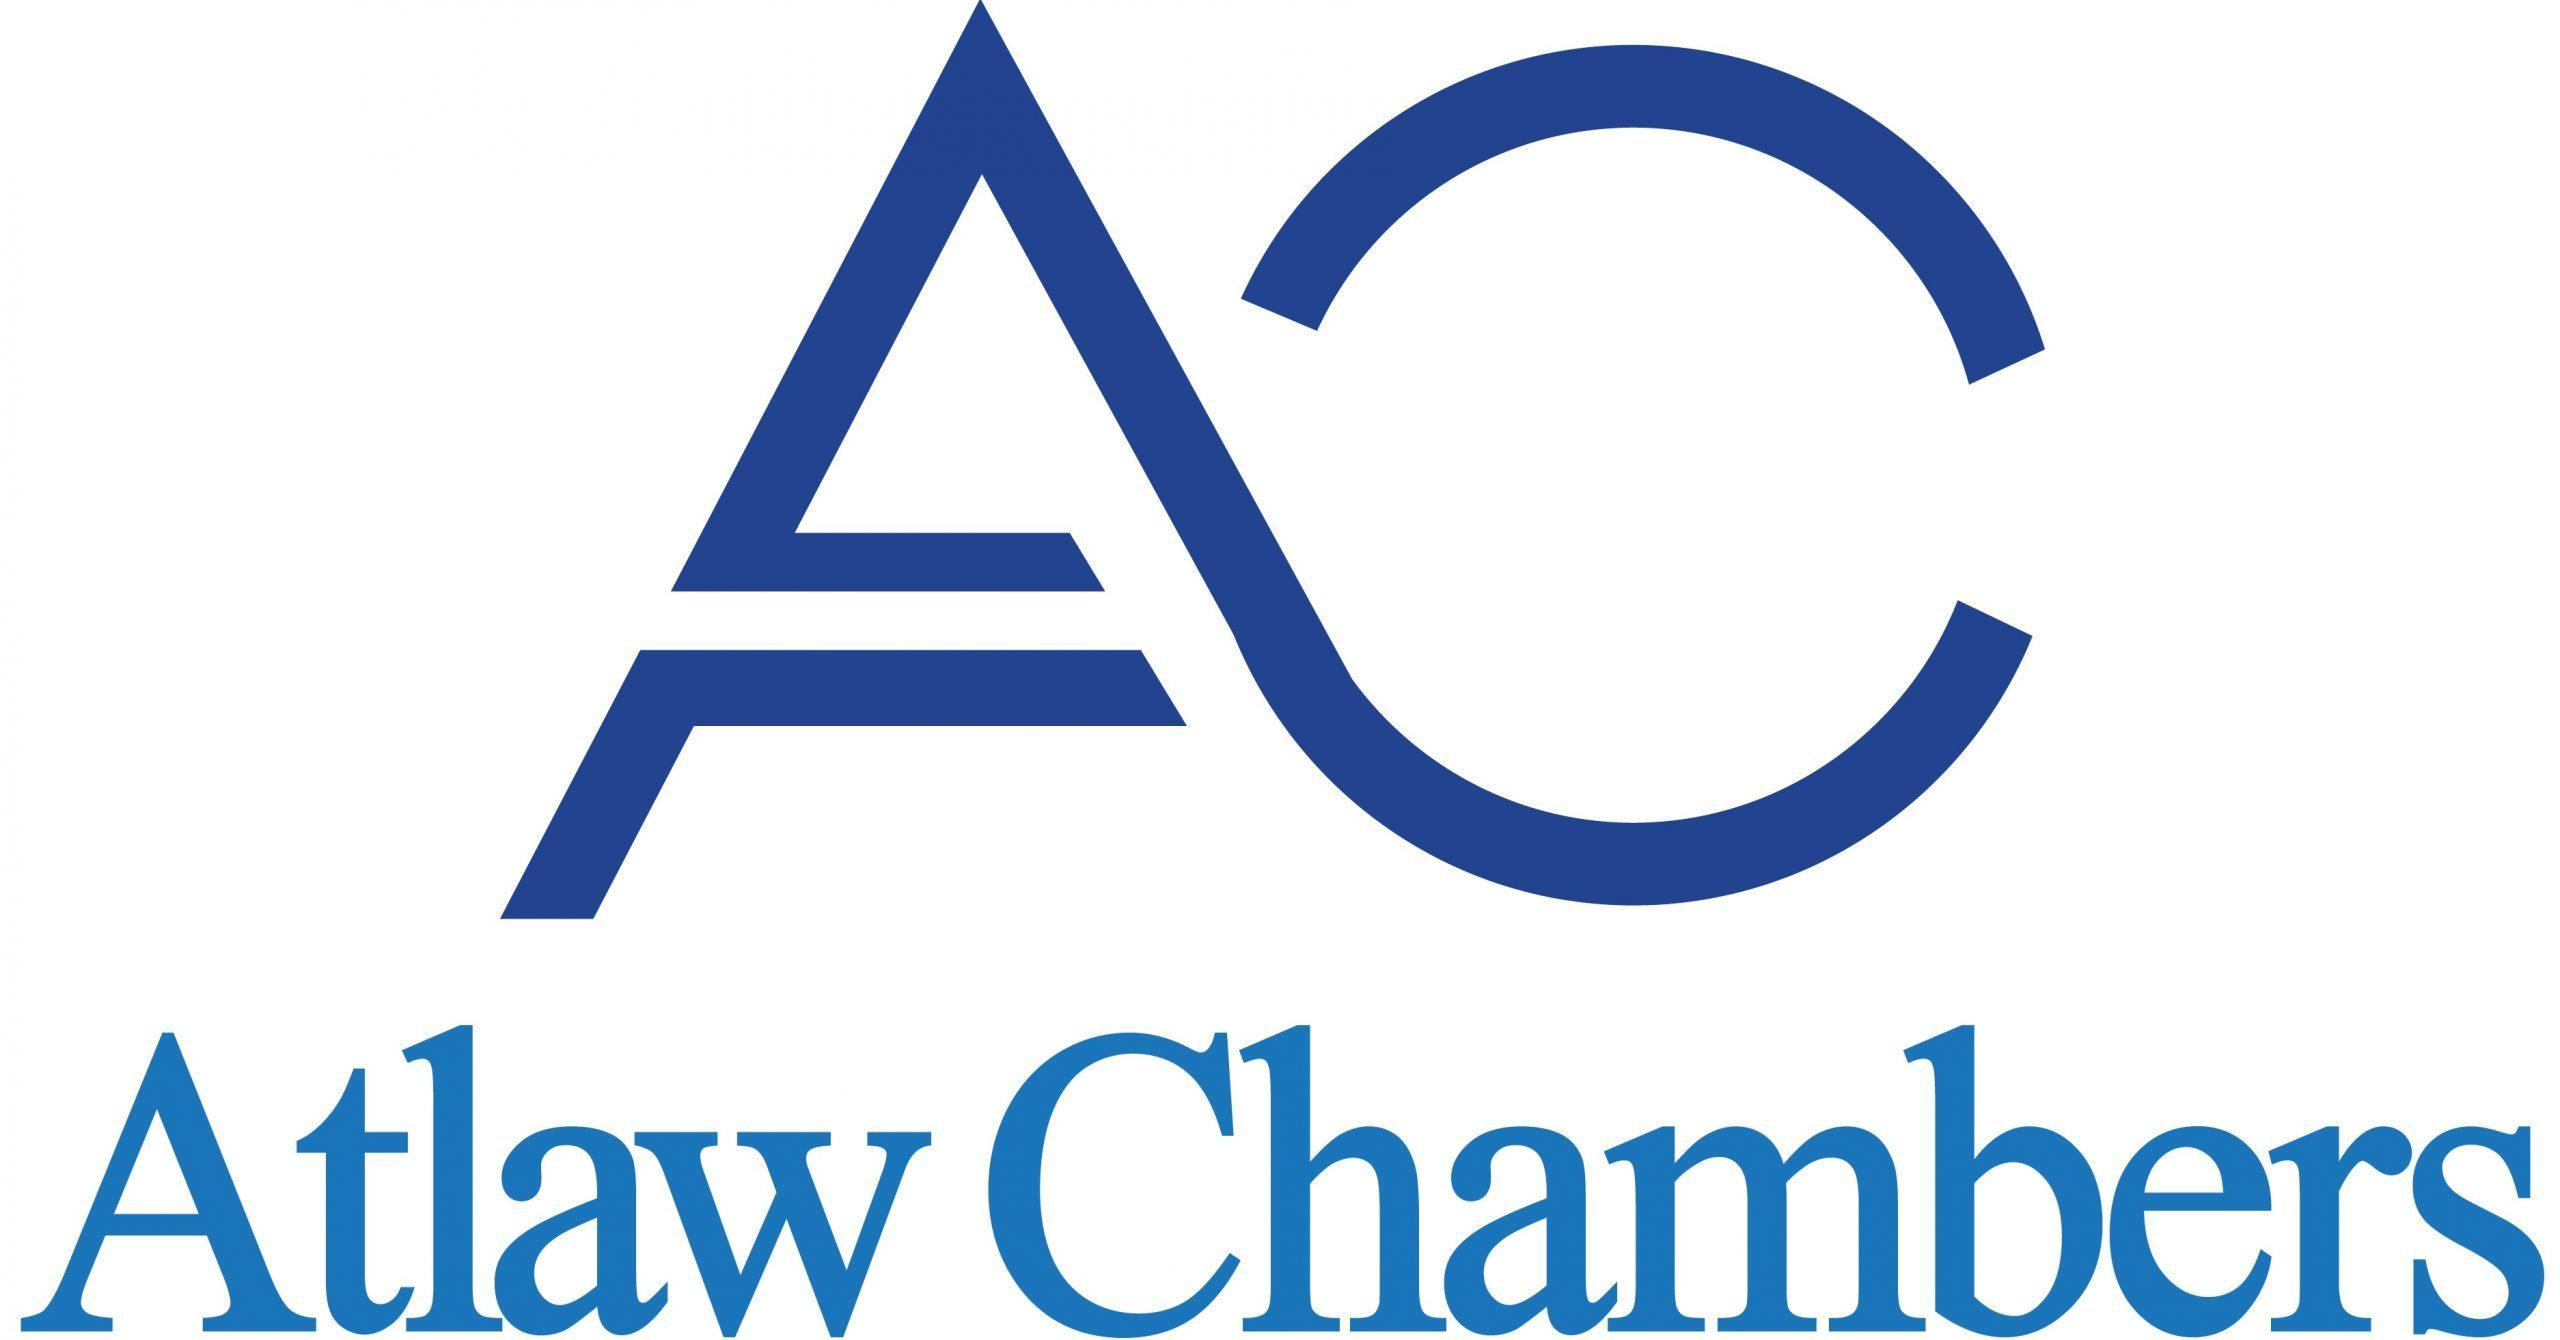 Atlaw Chambers